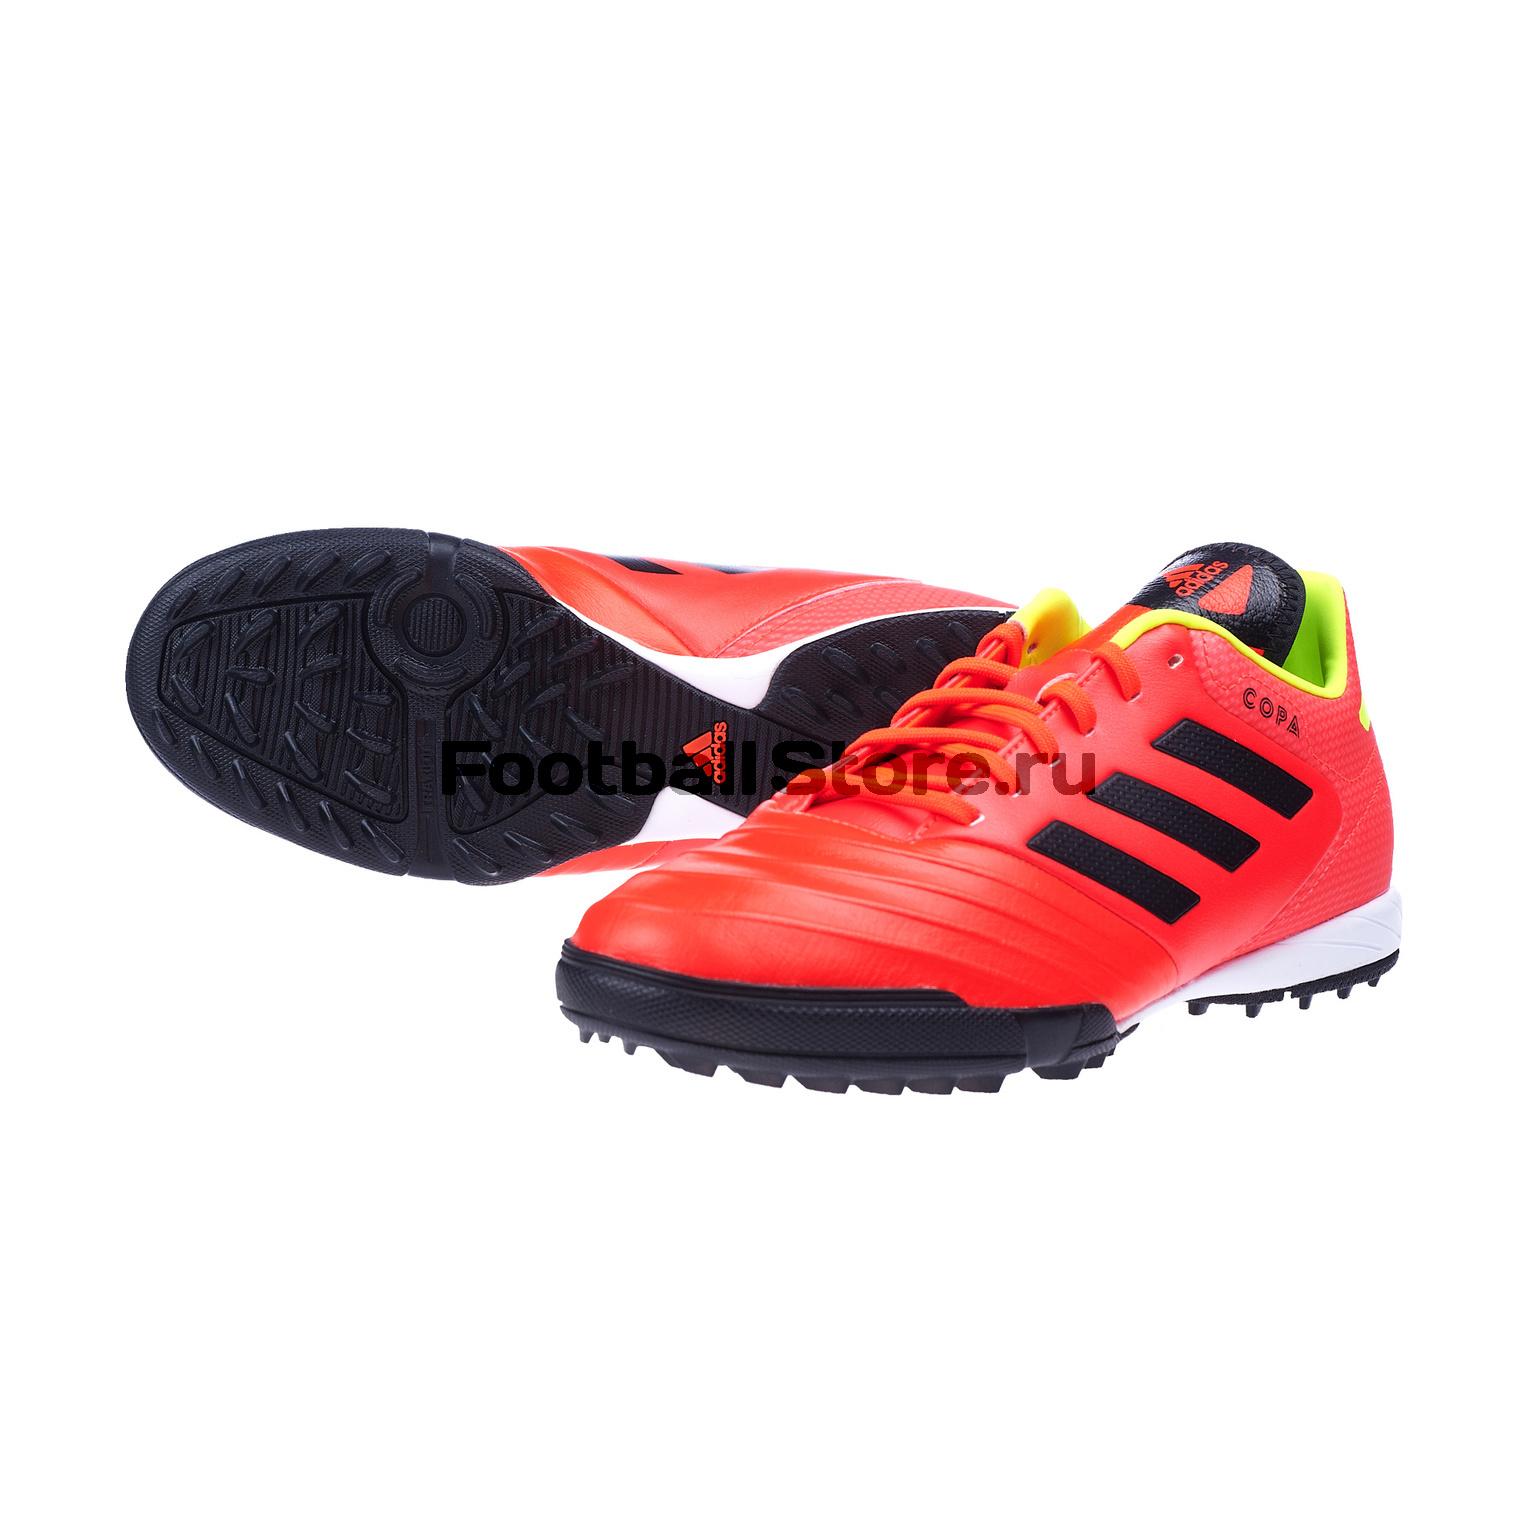 Шиповки Adidas Copa Tango 18.3 TF DB2415